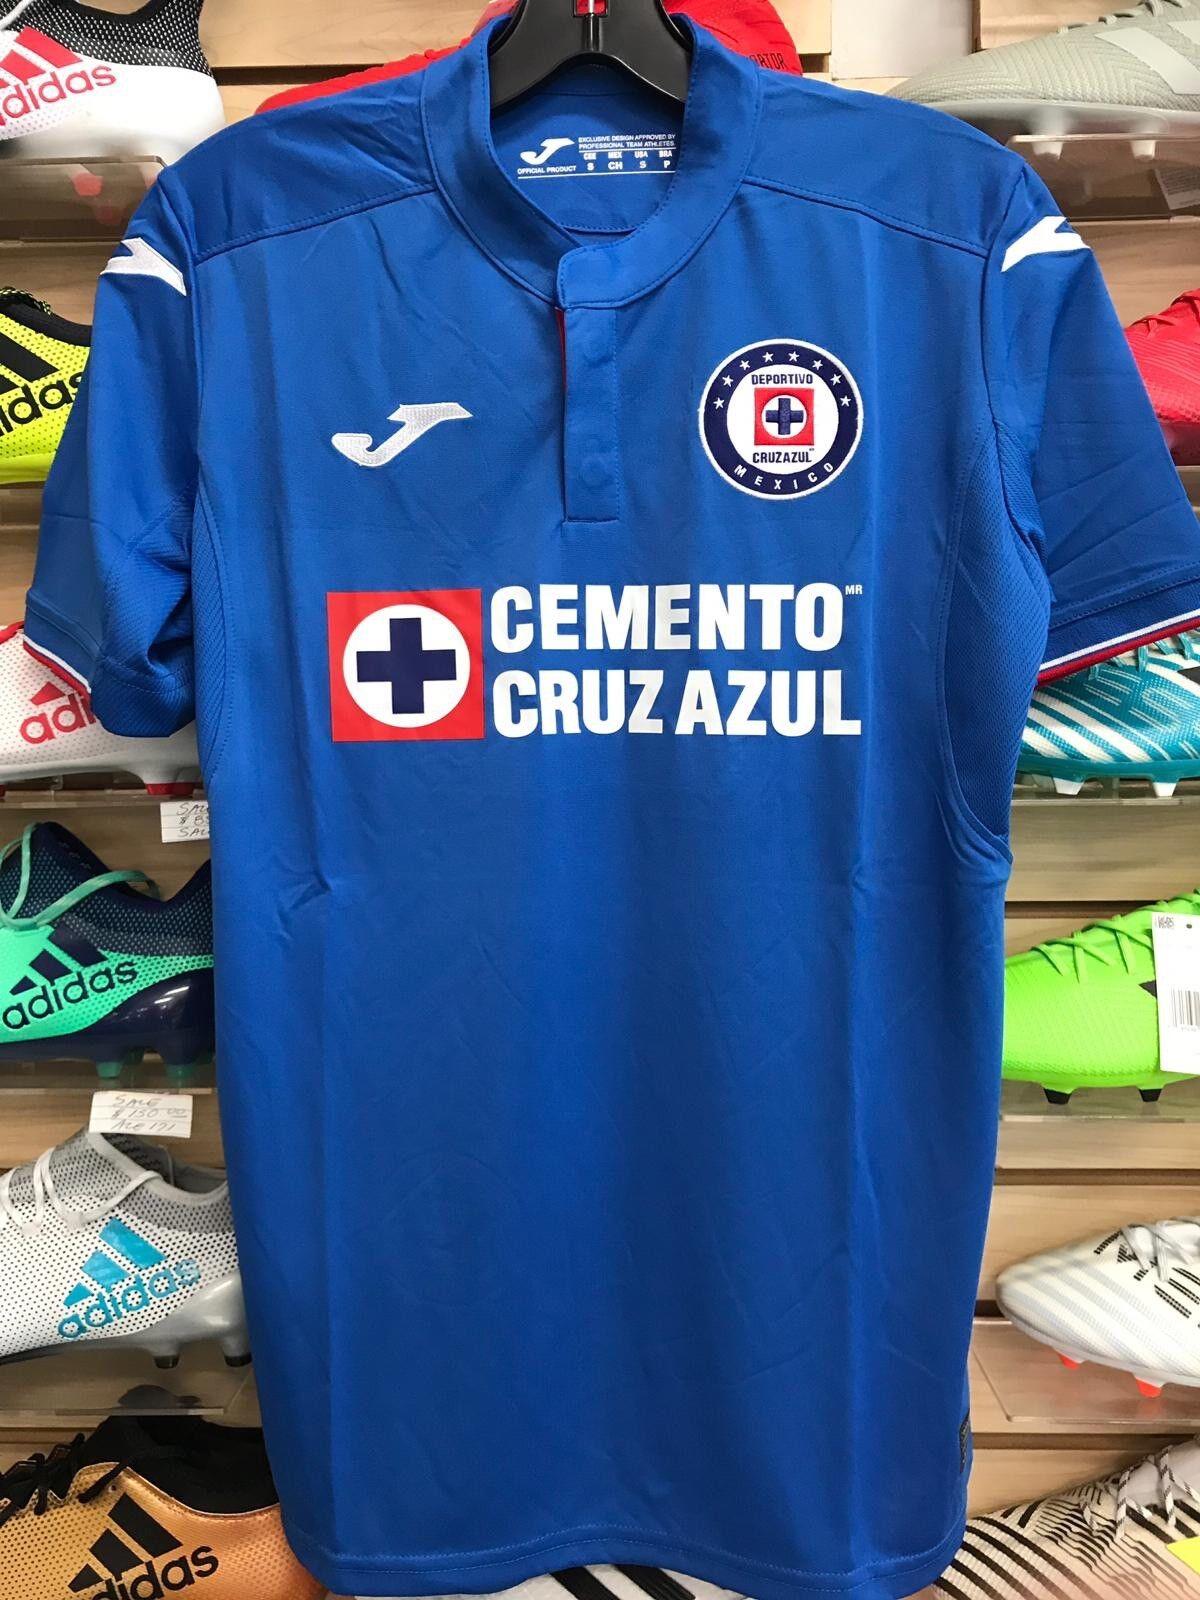 Cruz blu 2019 Joma Soccer Jerseycamisa Del Cruz blu Original Joma Diuominiione S